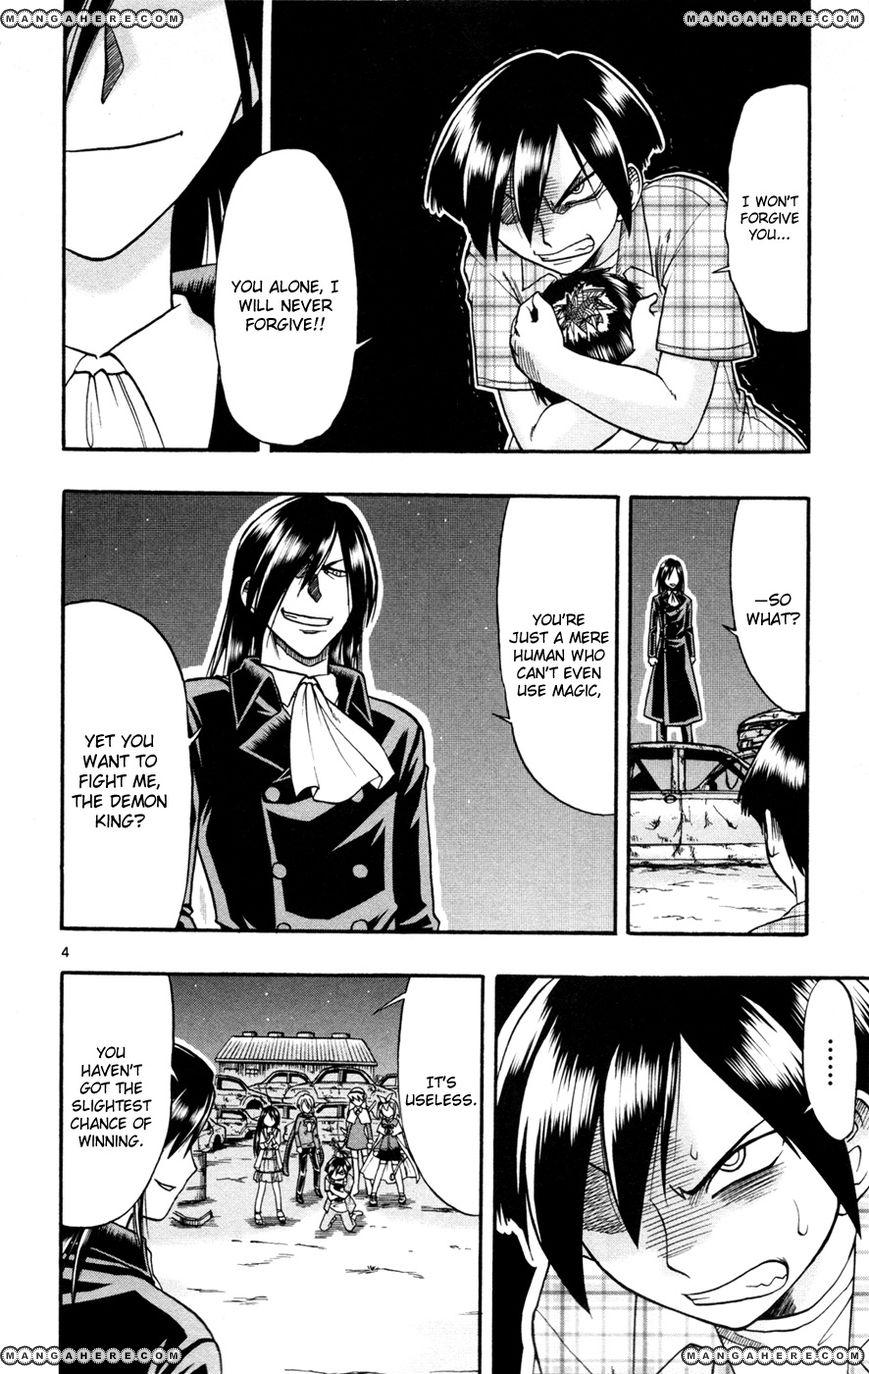 Mahou no Iroha! 15 Page 3